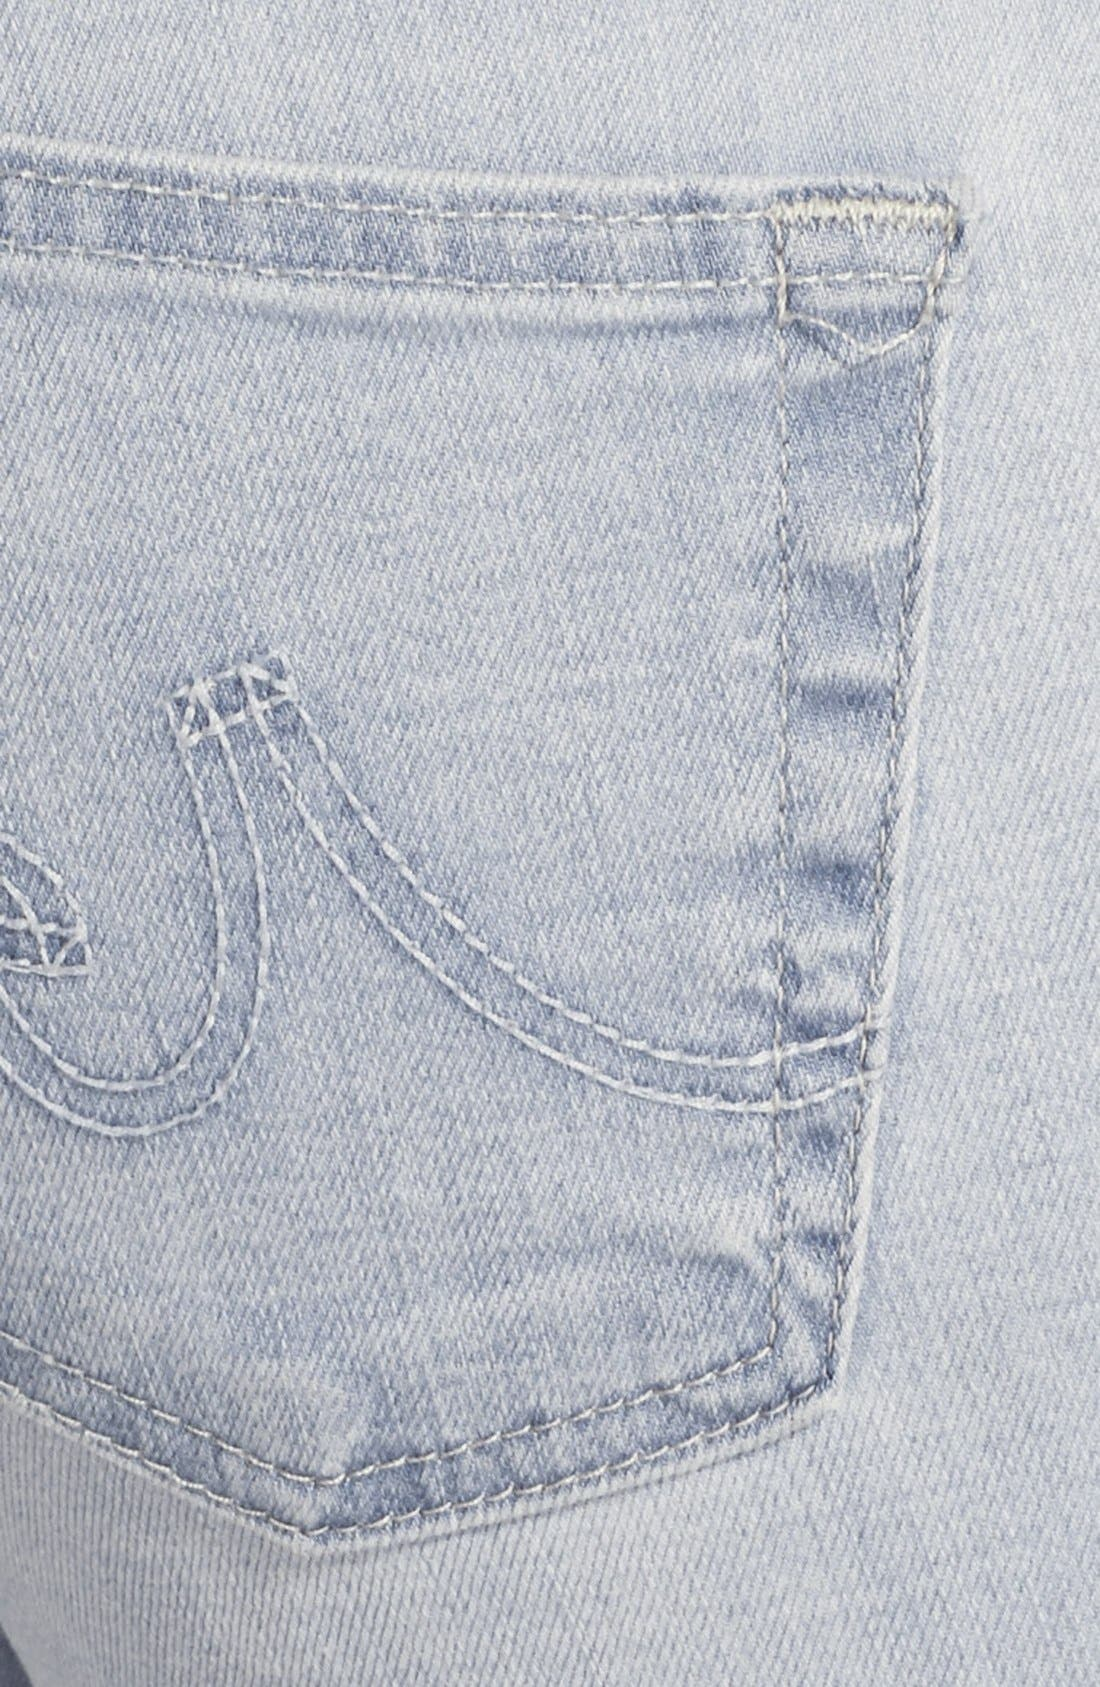 Alternate Image 3  - AG Jeans 'The Stilt' Crop Skinny Stretch Jeans (22 Year Wanderer)